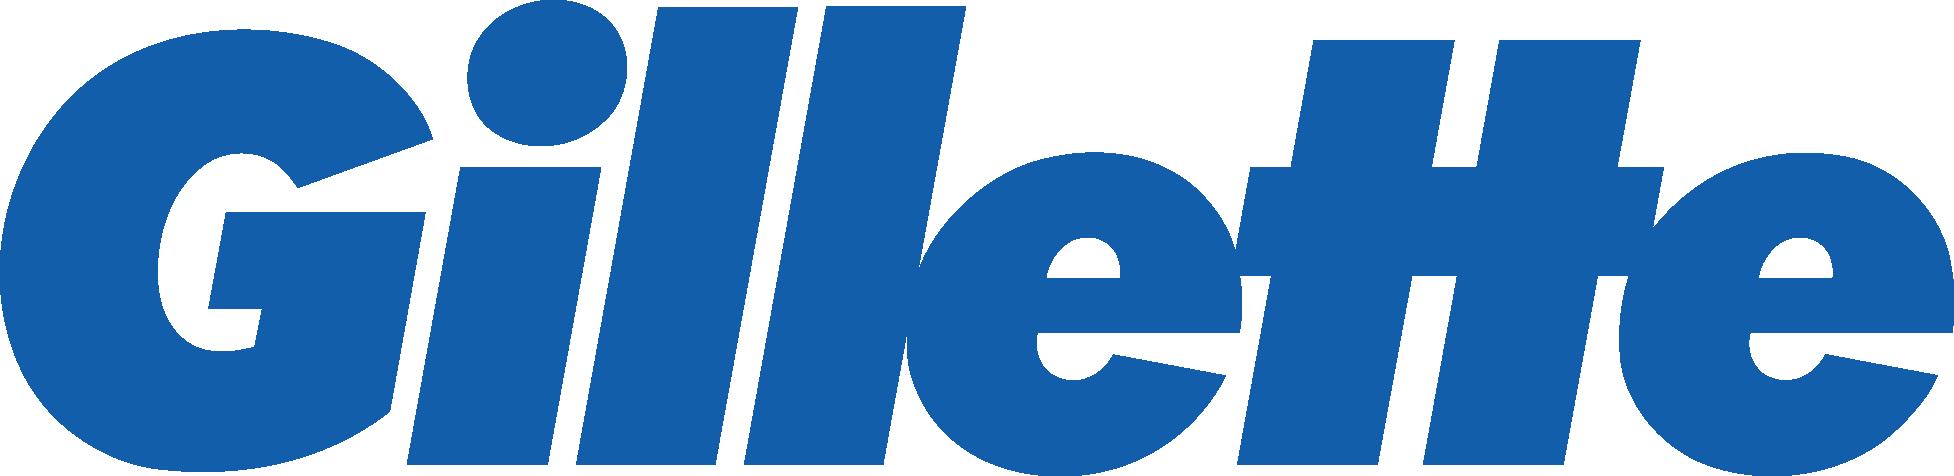 Logo Gilette